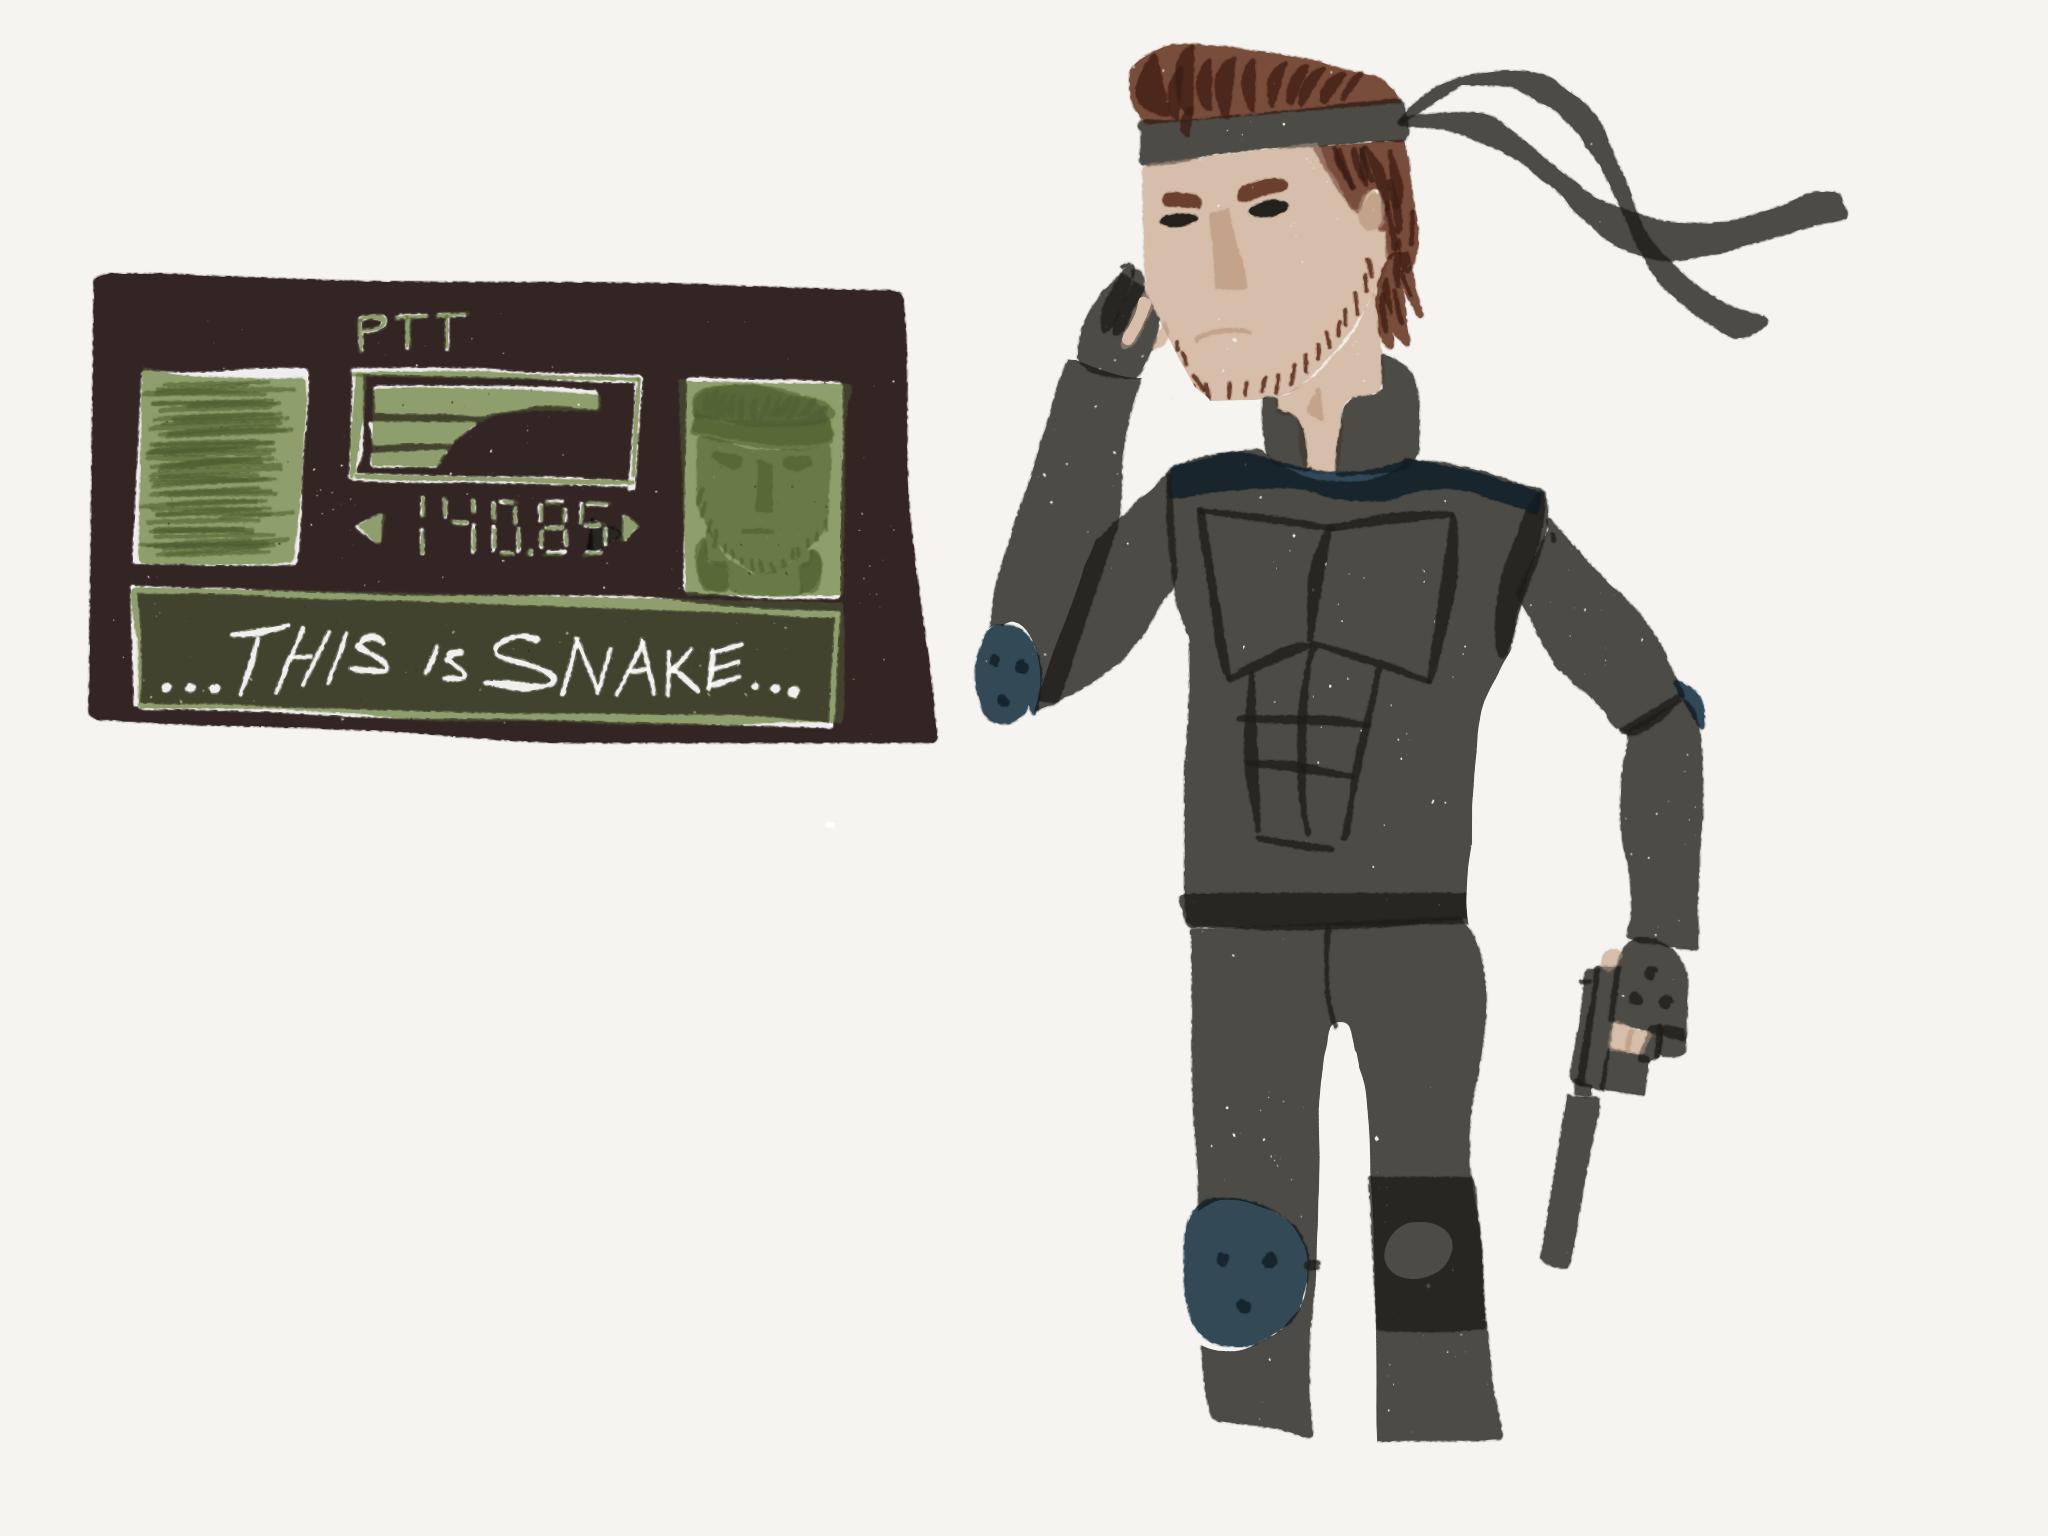 Drew some Snake on my flight home #MetalGearSolid #mgs #MGSV #MetalGear #Konami #cosplay #PS4 #game #MGSVTPP